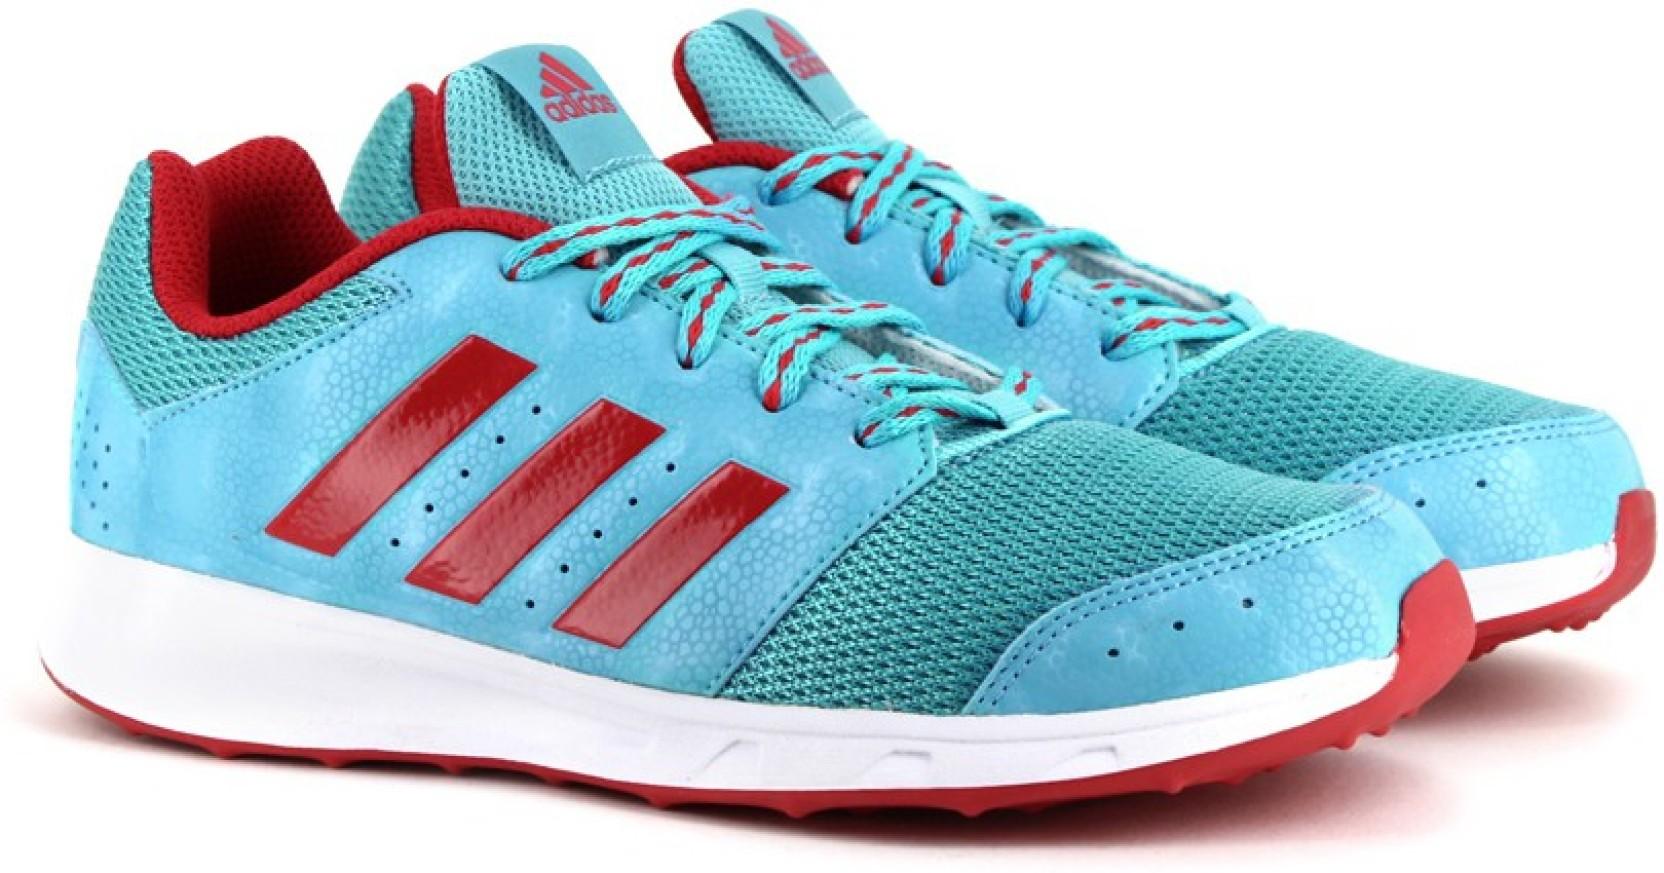 Adidas Boys & Girls Lace Price in India - Buy Adidas Boys ...